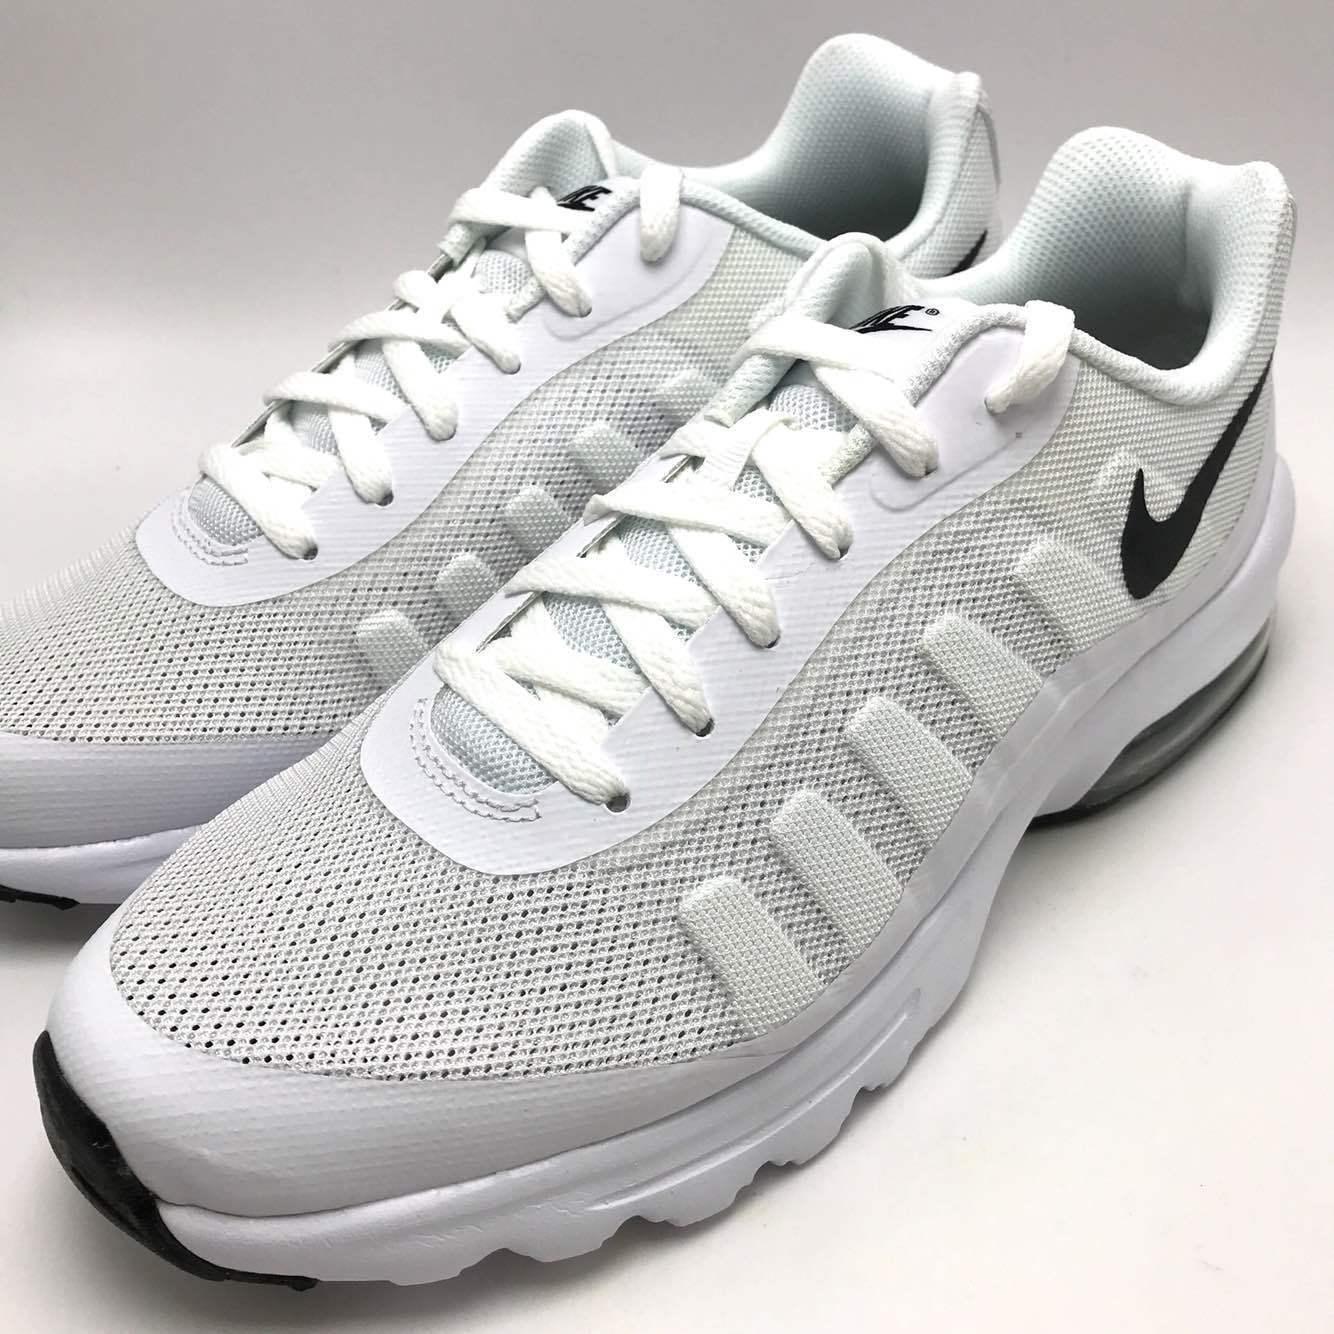 Nike Mens 749680 Running Shoes - Ljubavnioglasnik